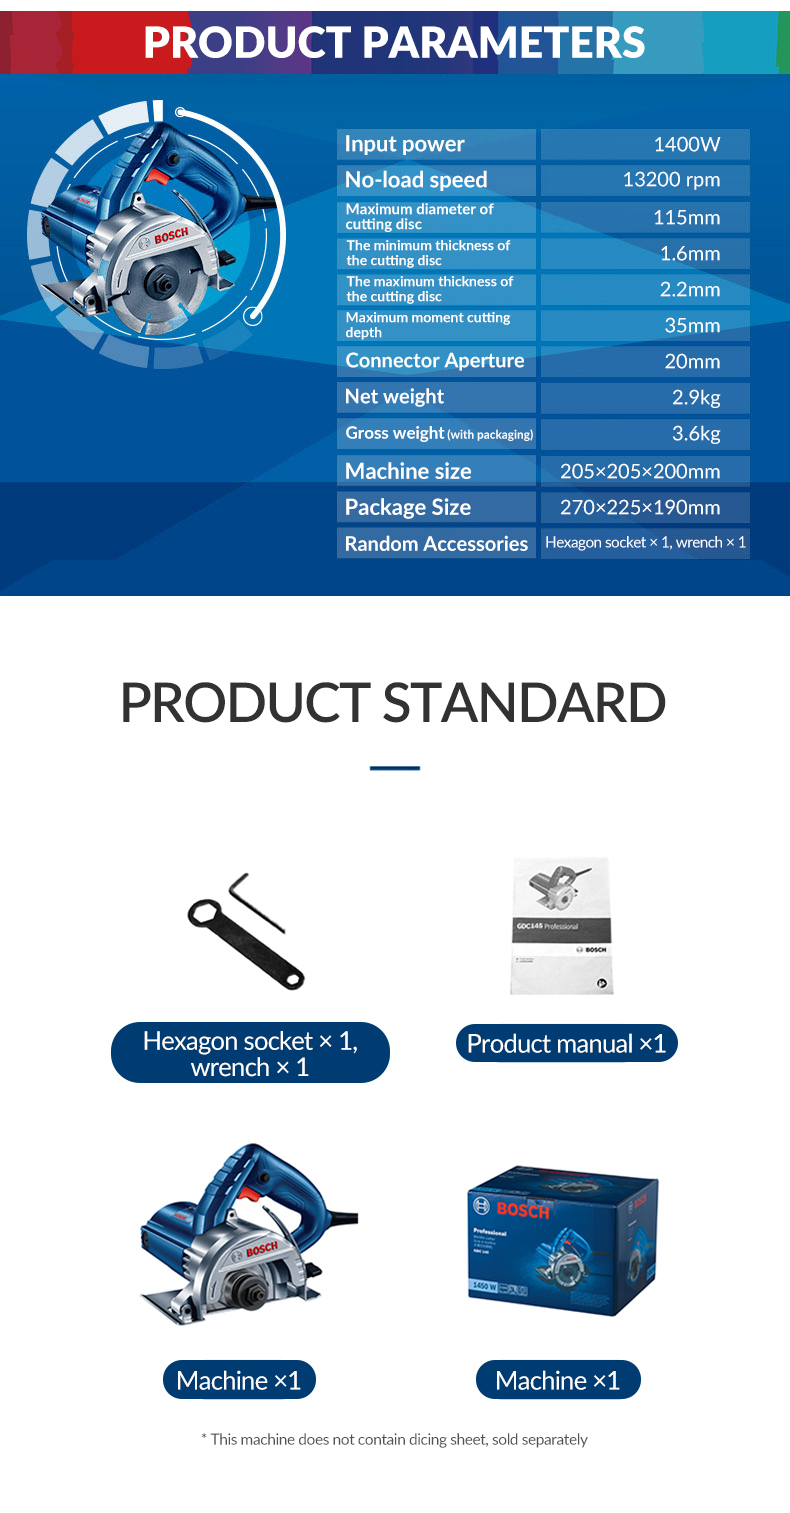 Product parameters of Bosch Electric Mini Circular Saw